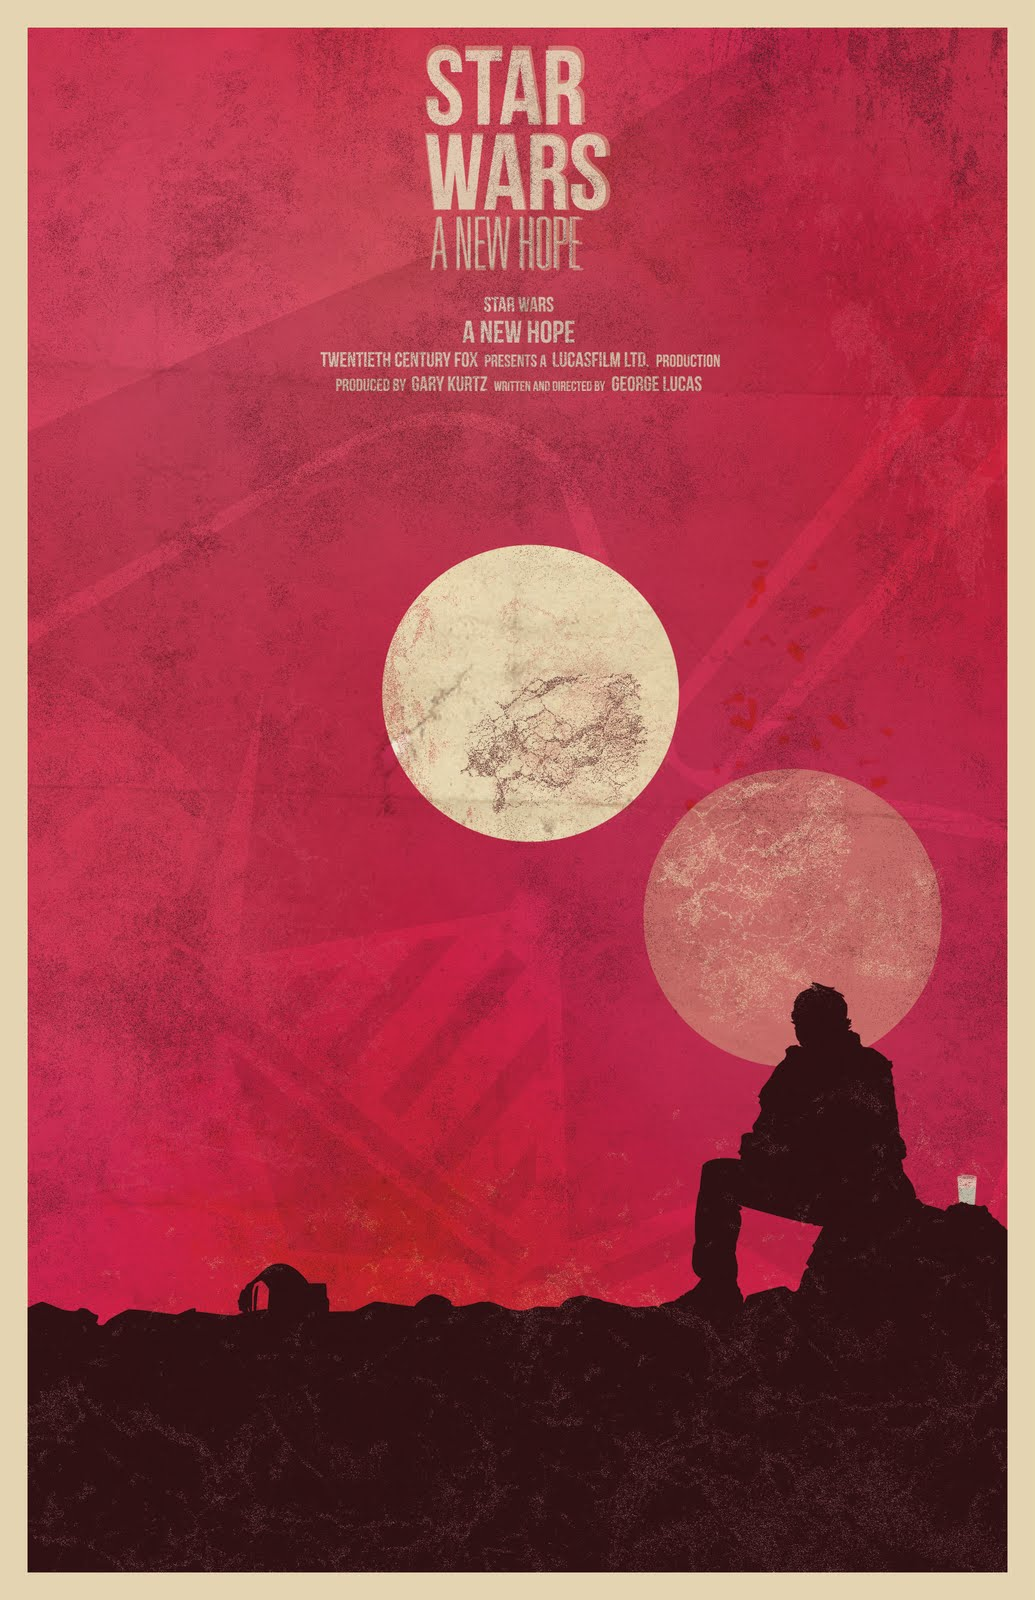 The Geeky Nerfherder: Movie Poster Art: Star Wars (1977)